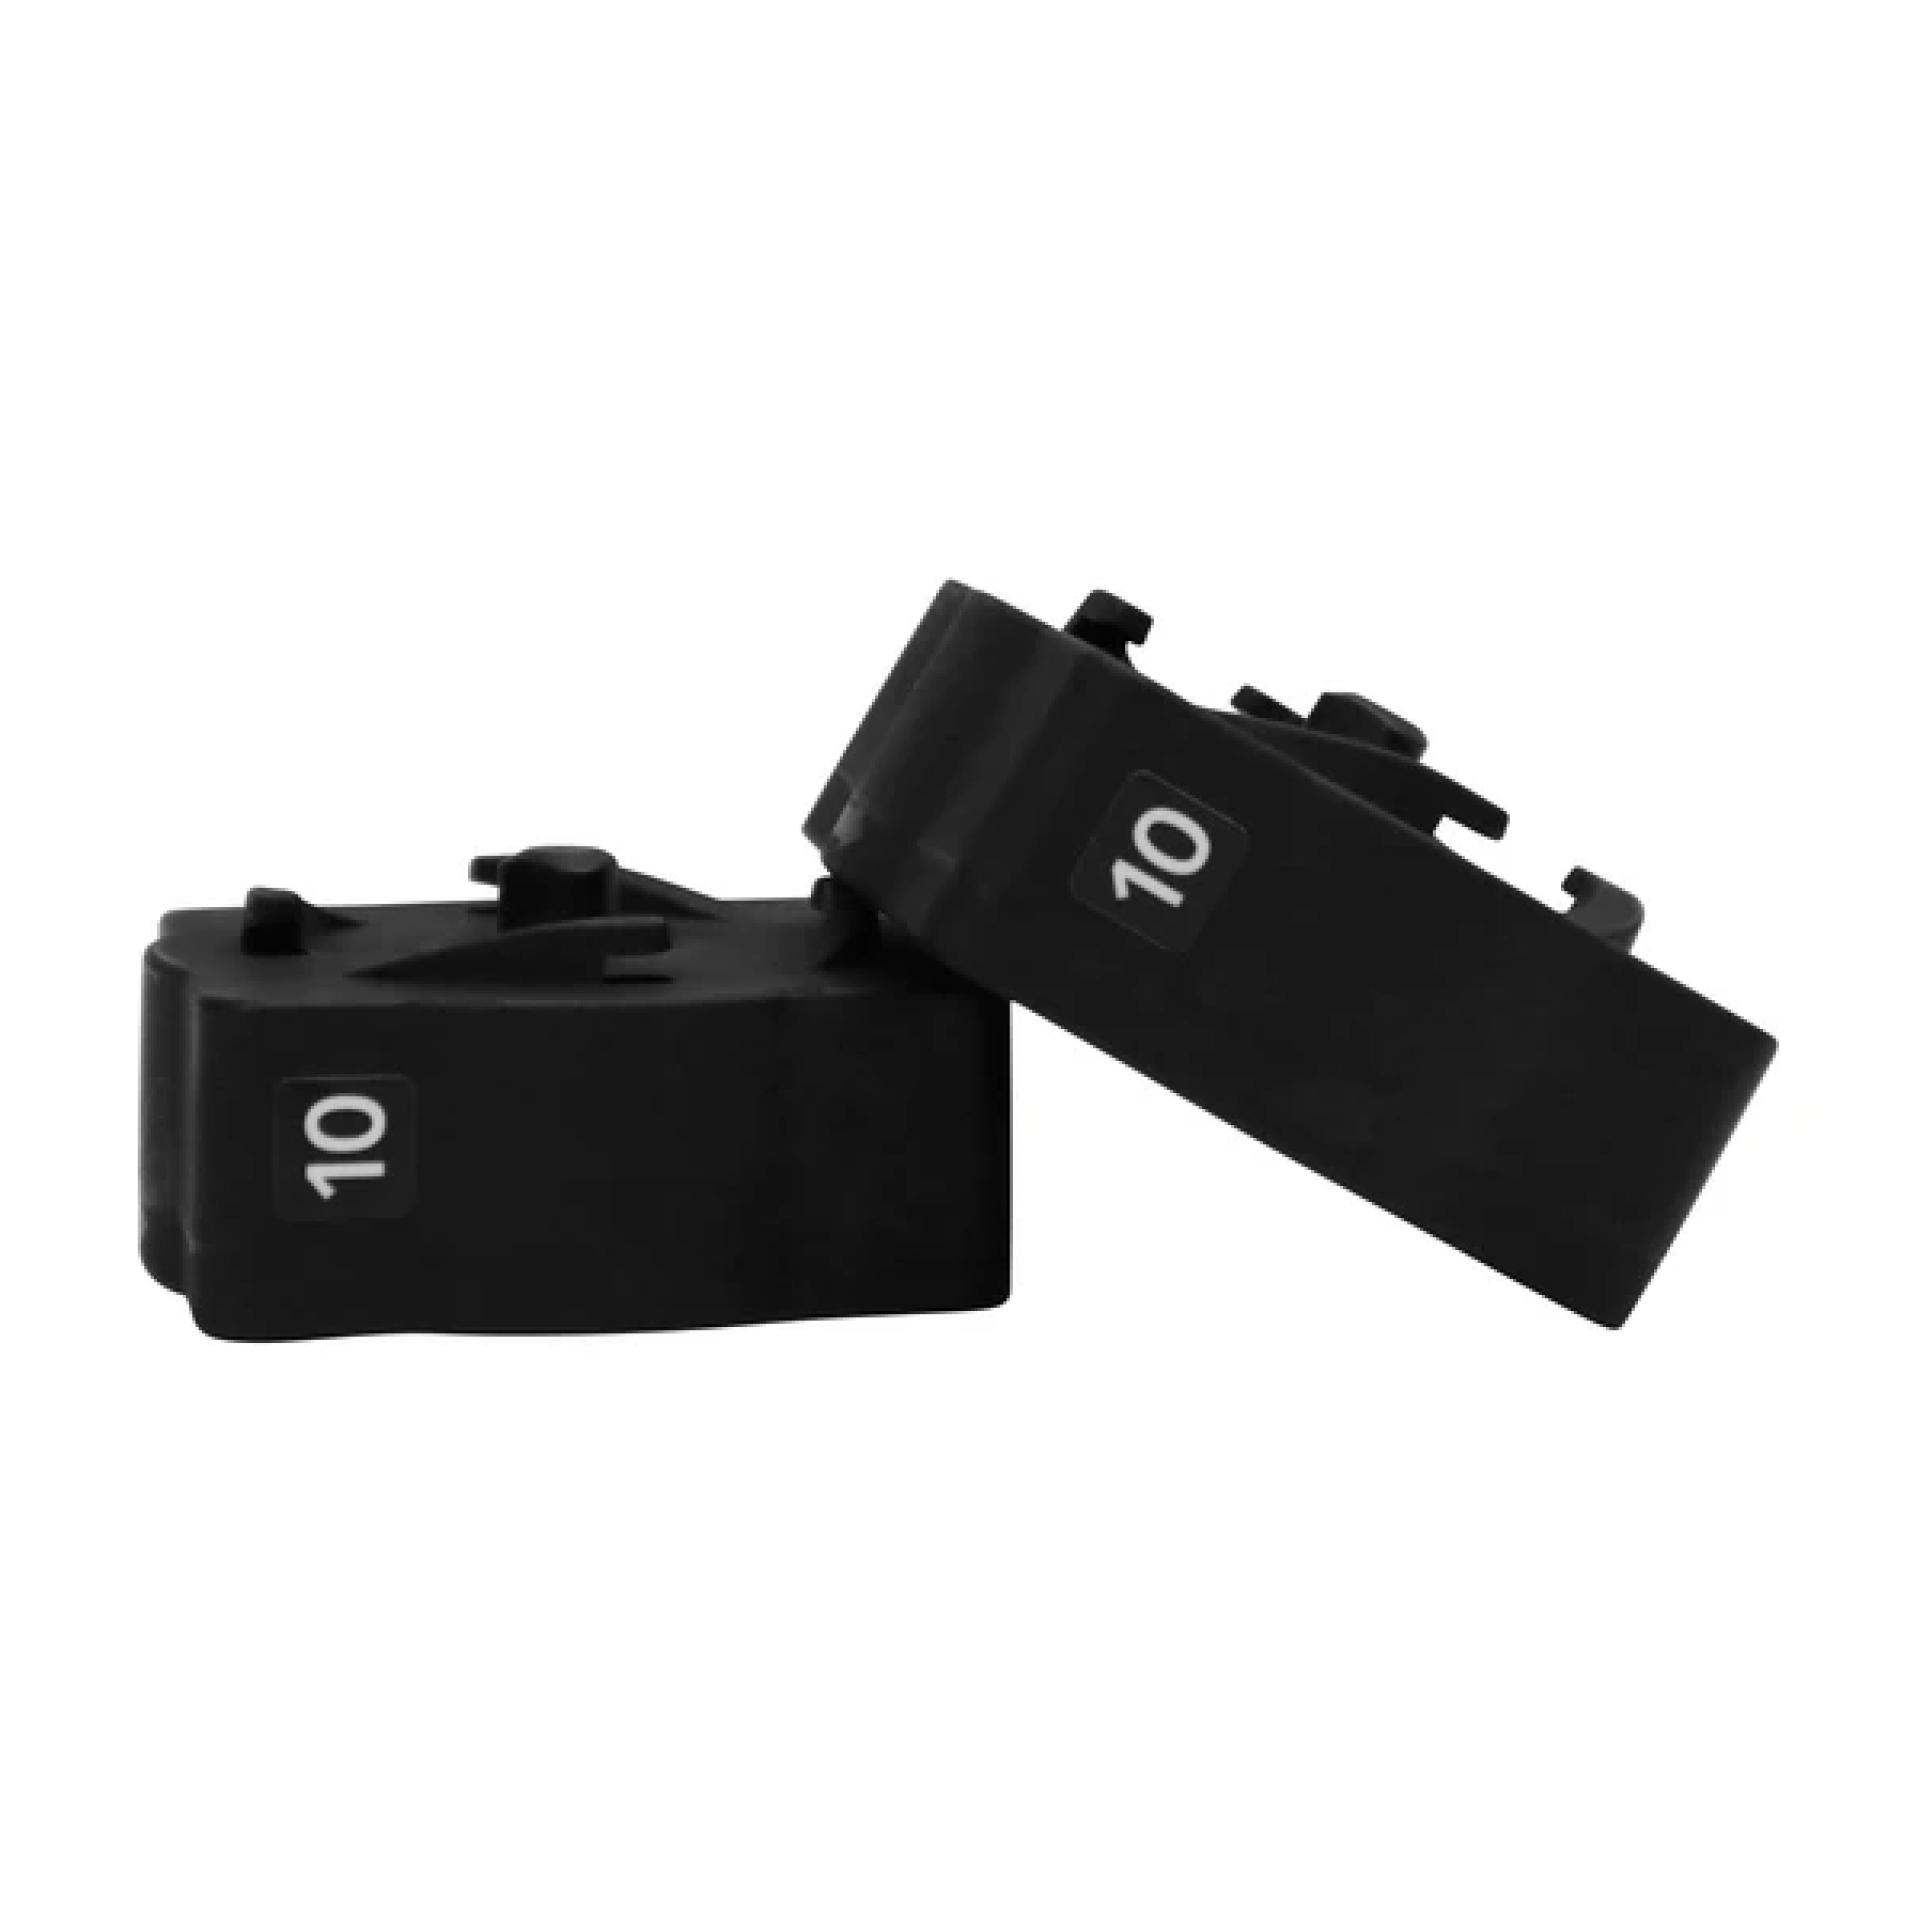 Ancore Trainer Pro - Resistance Plates 2x 10lbs (Zubehör)